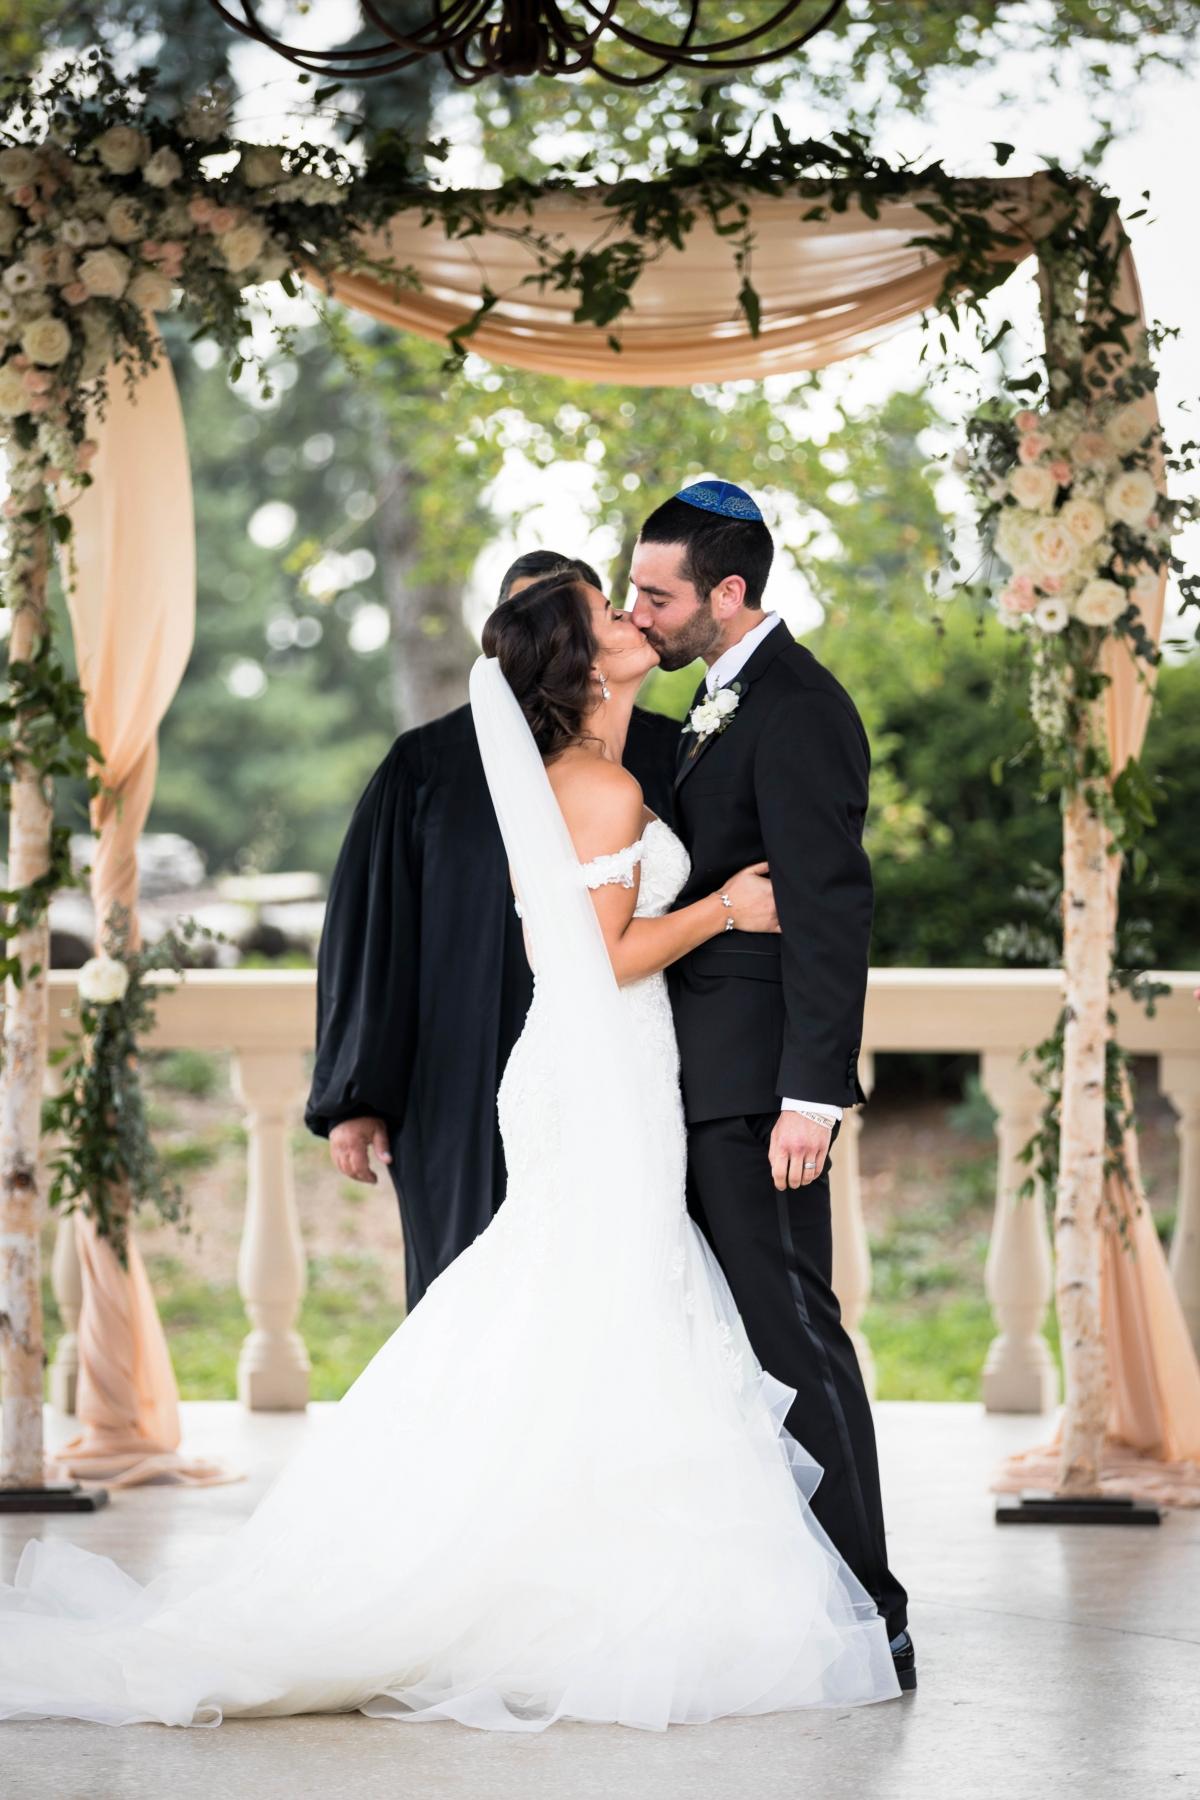 marie.jeremy wedding rachael.schirano 338